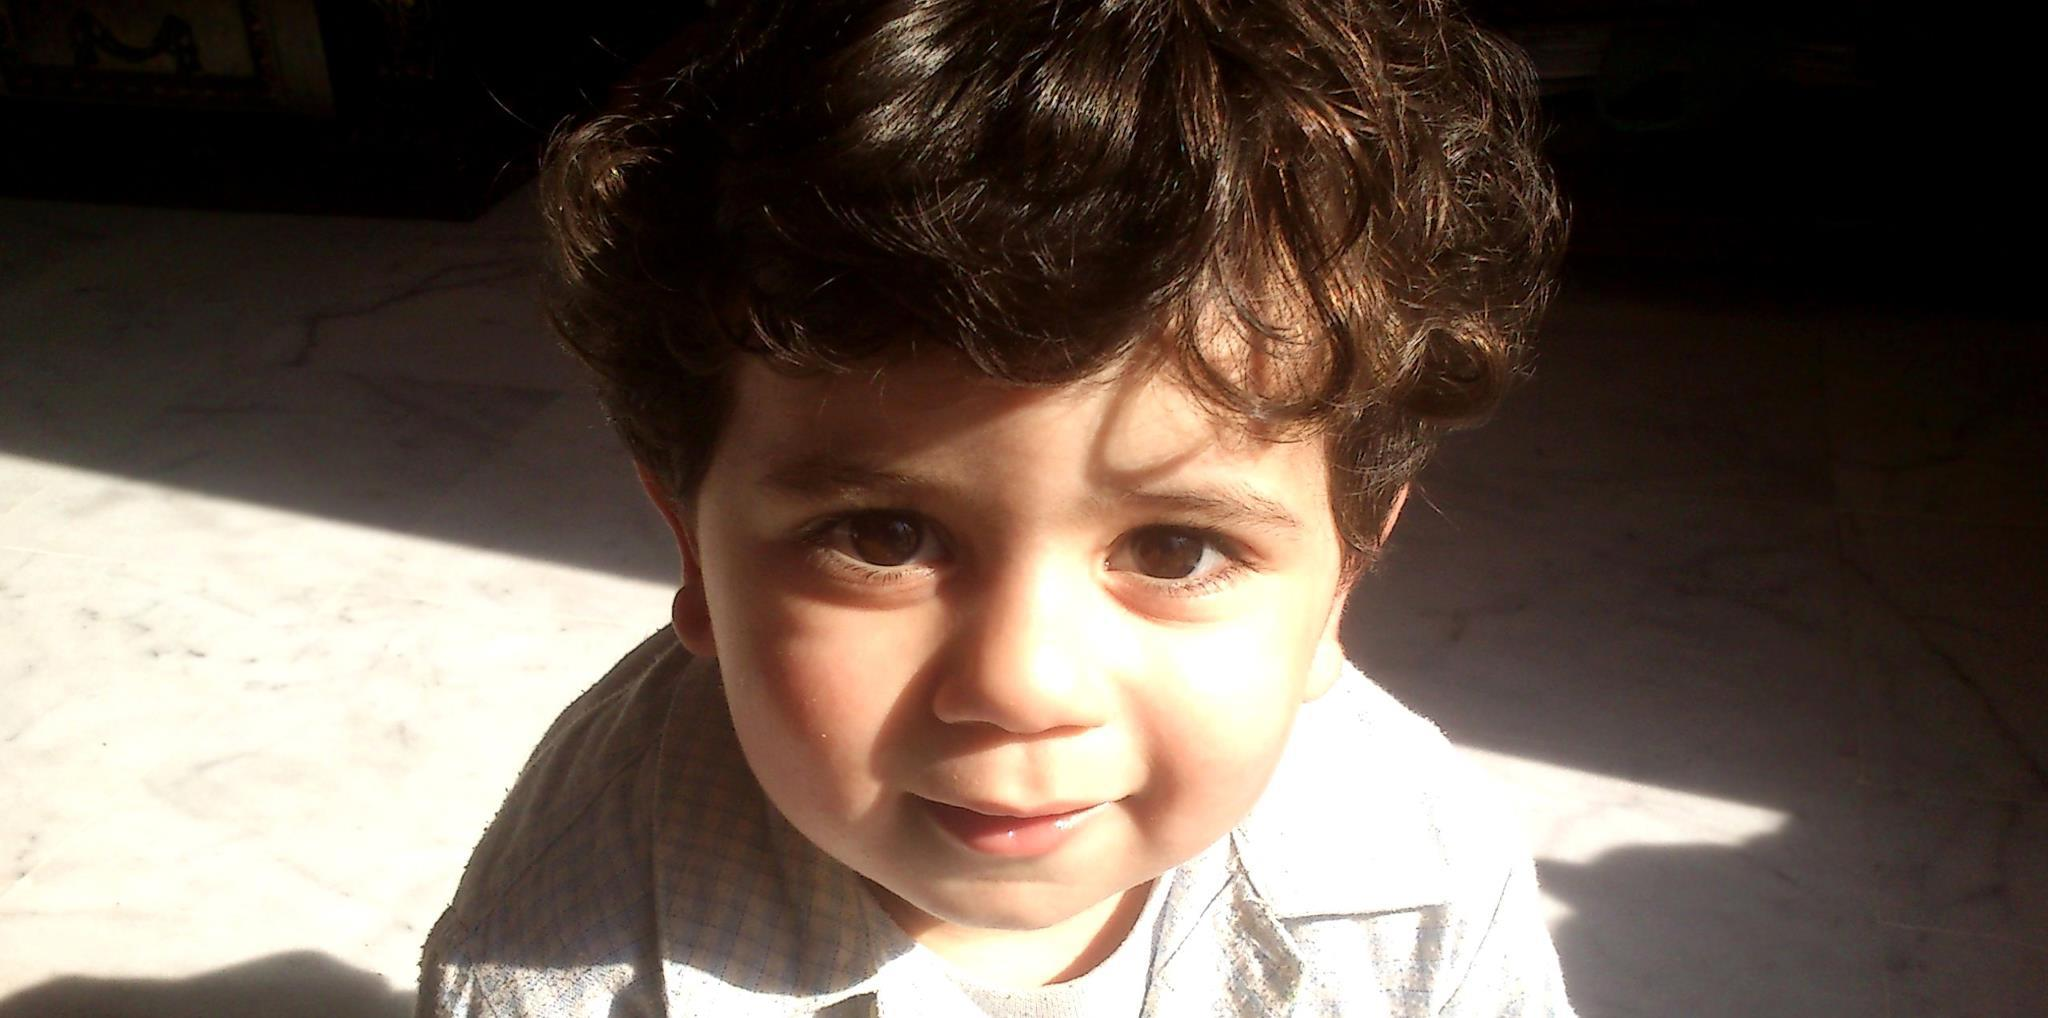 بالصور صور اولاد حلوين , شاهد بالصور اجمل الاطفال الاولاد 429